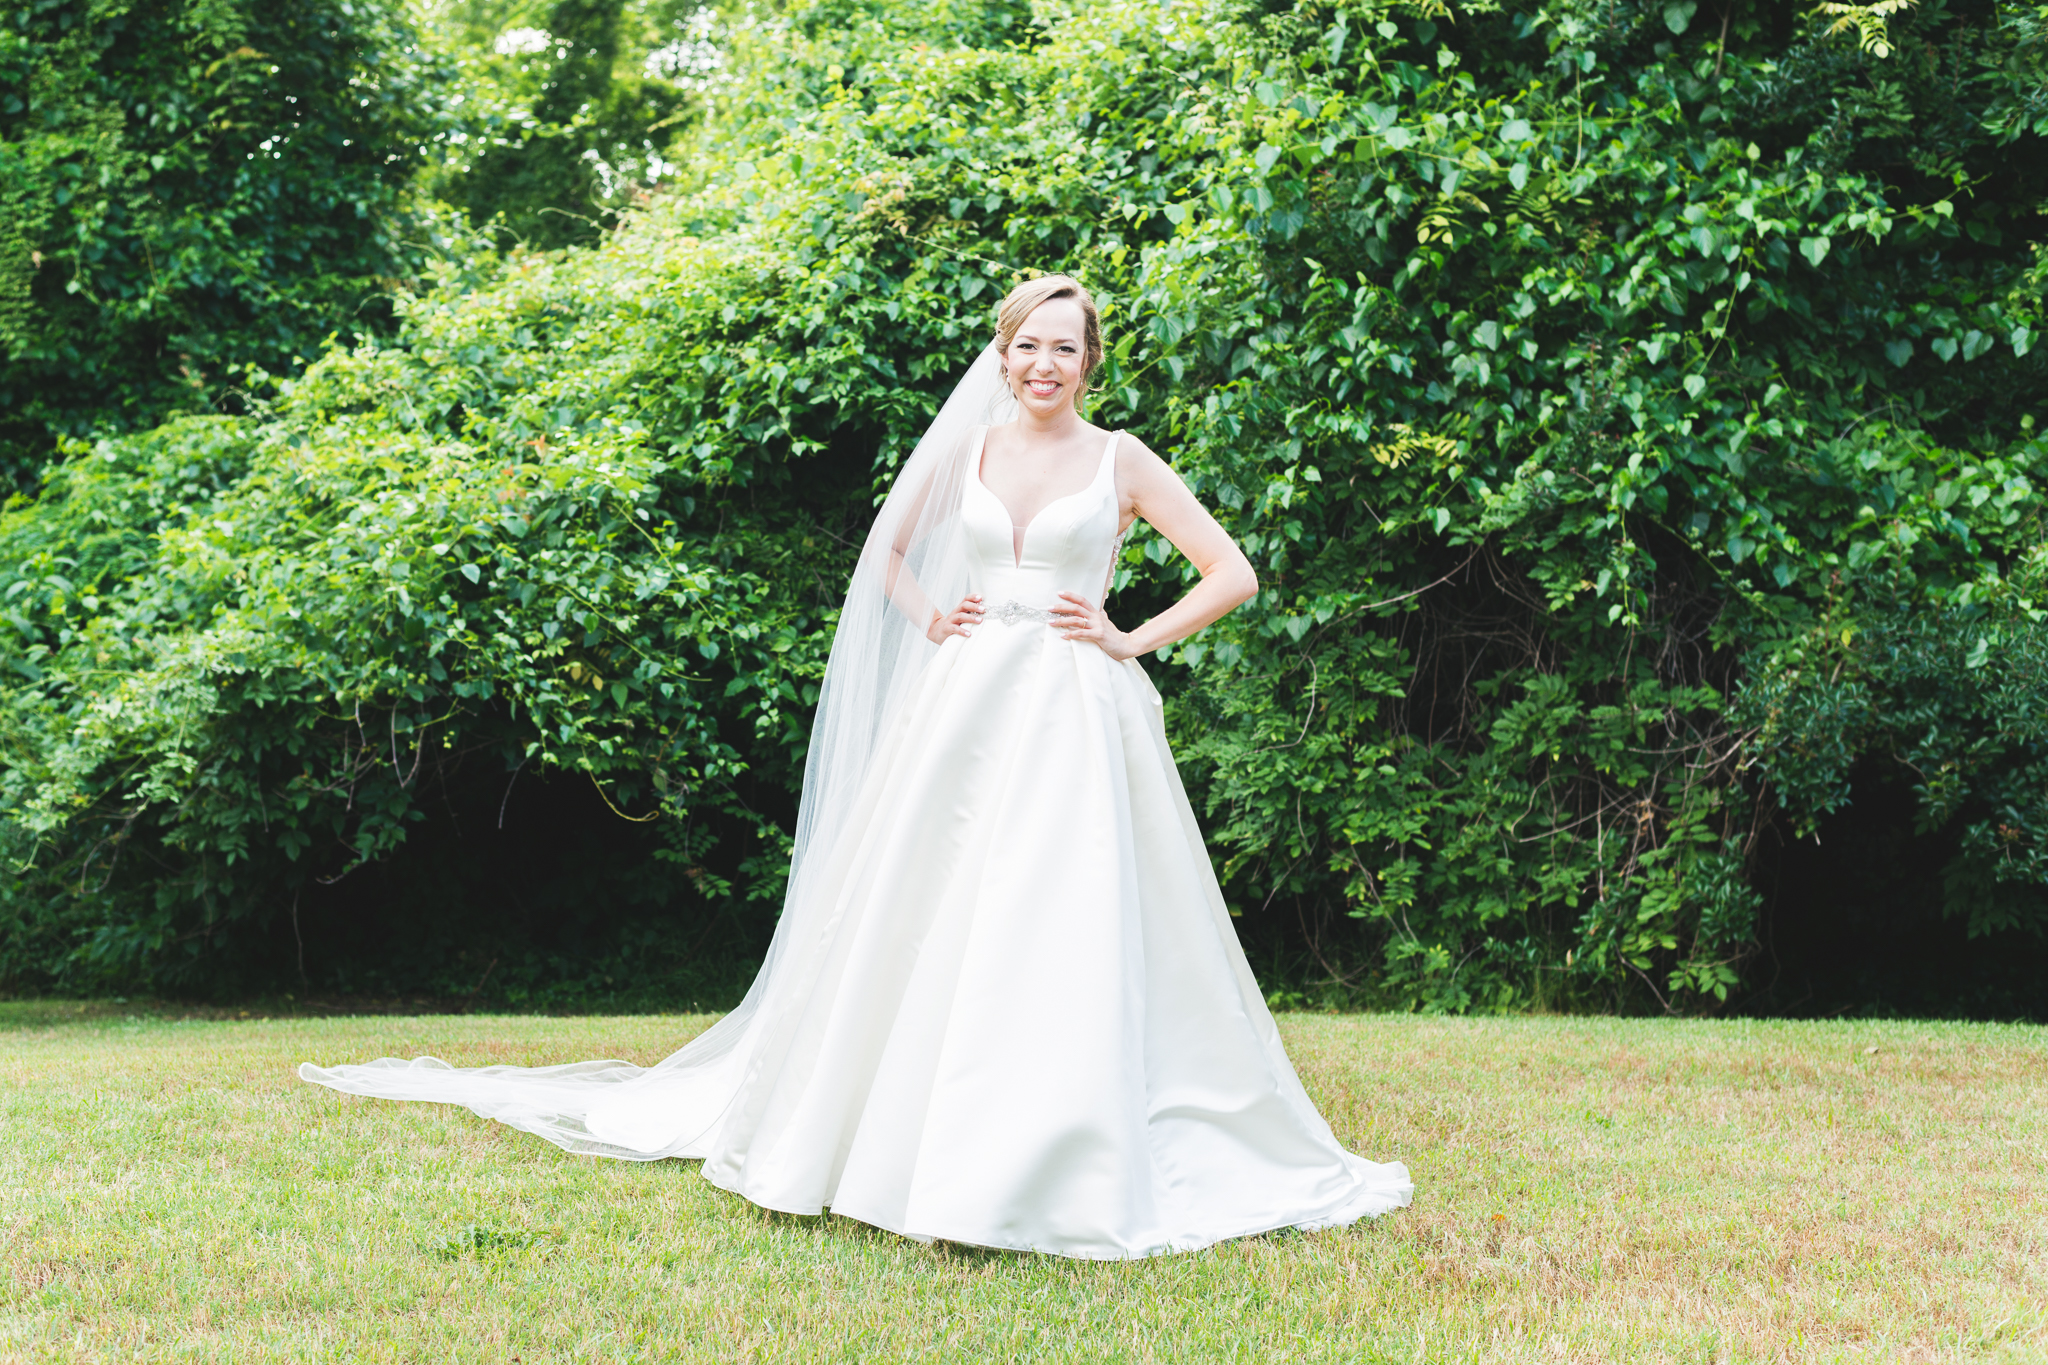 Bridals_MadisonReke_Blog-12.jpg